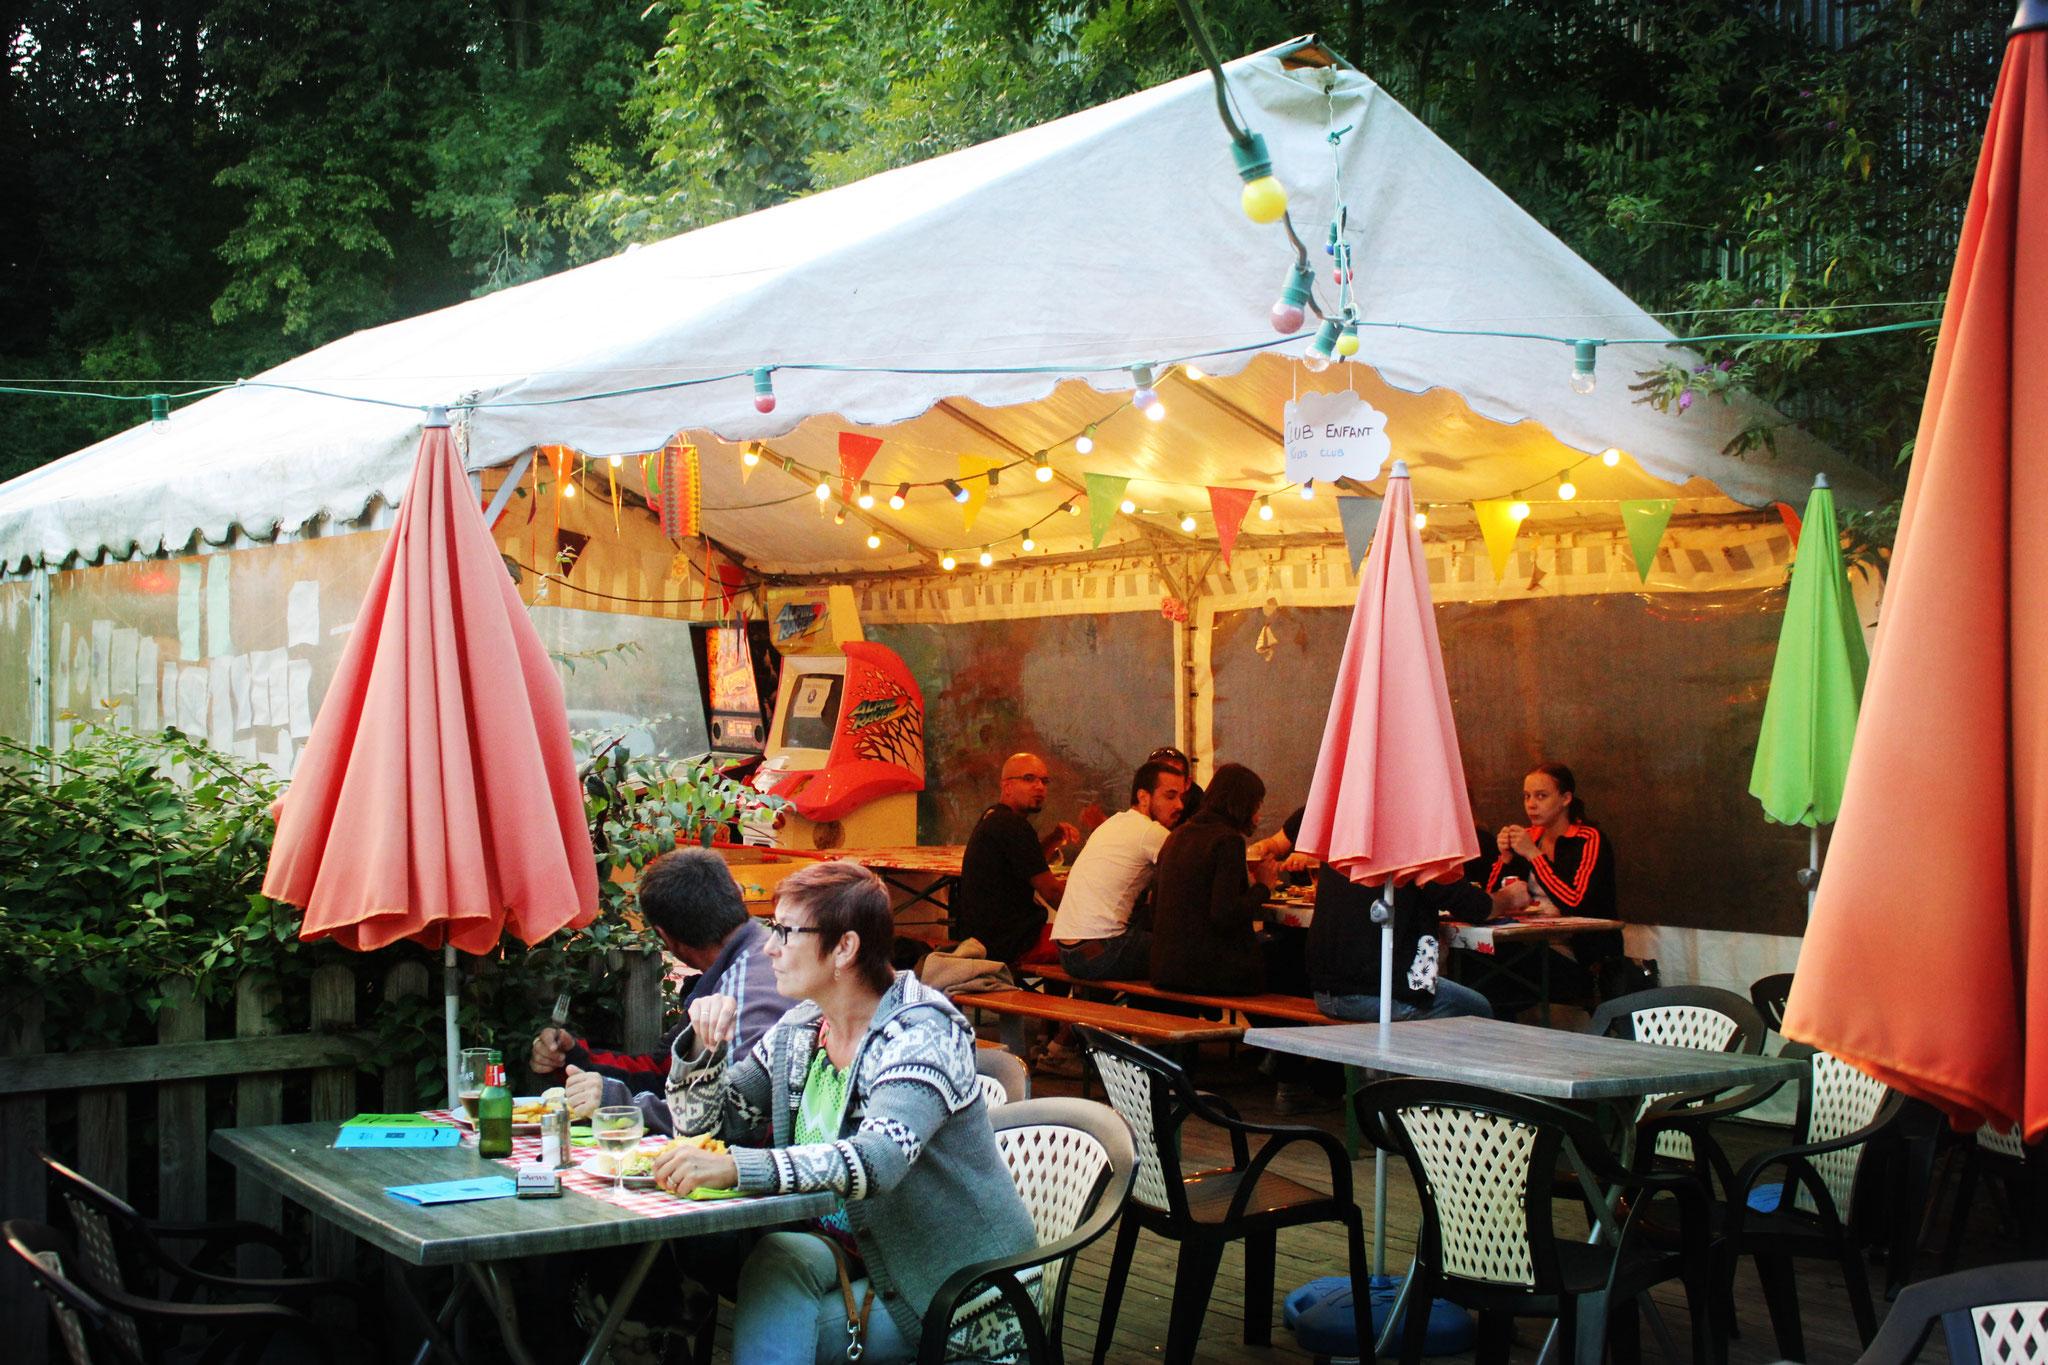 Brasserie et bar avec terrasse dans le camping en Baie de Somme